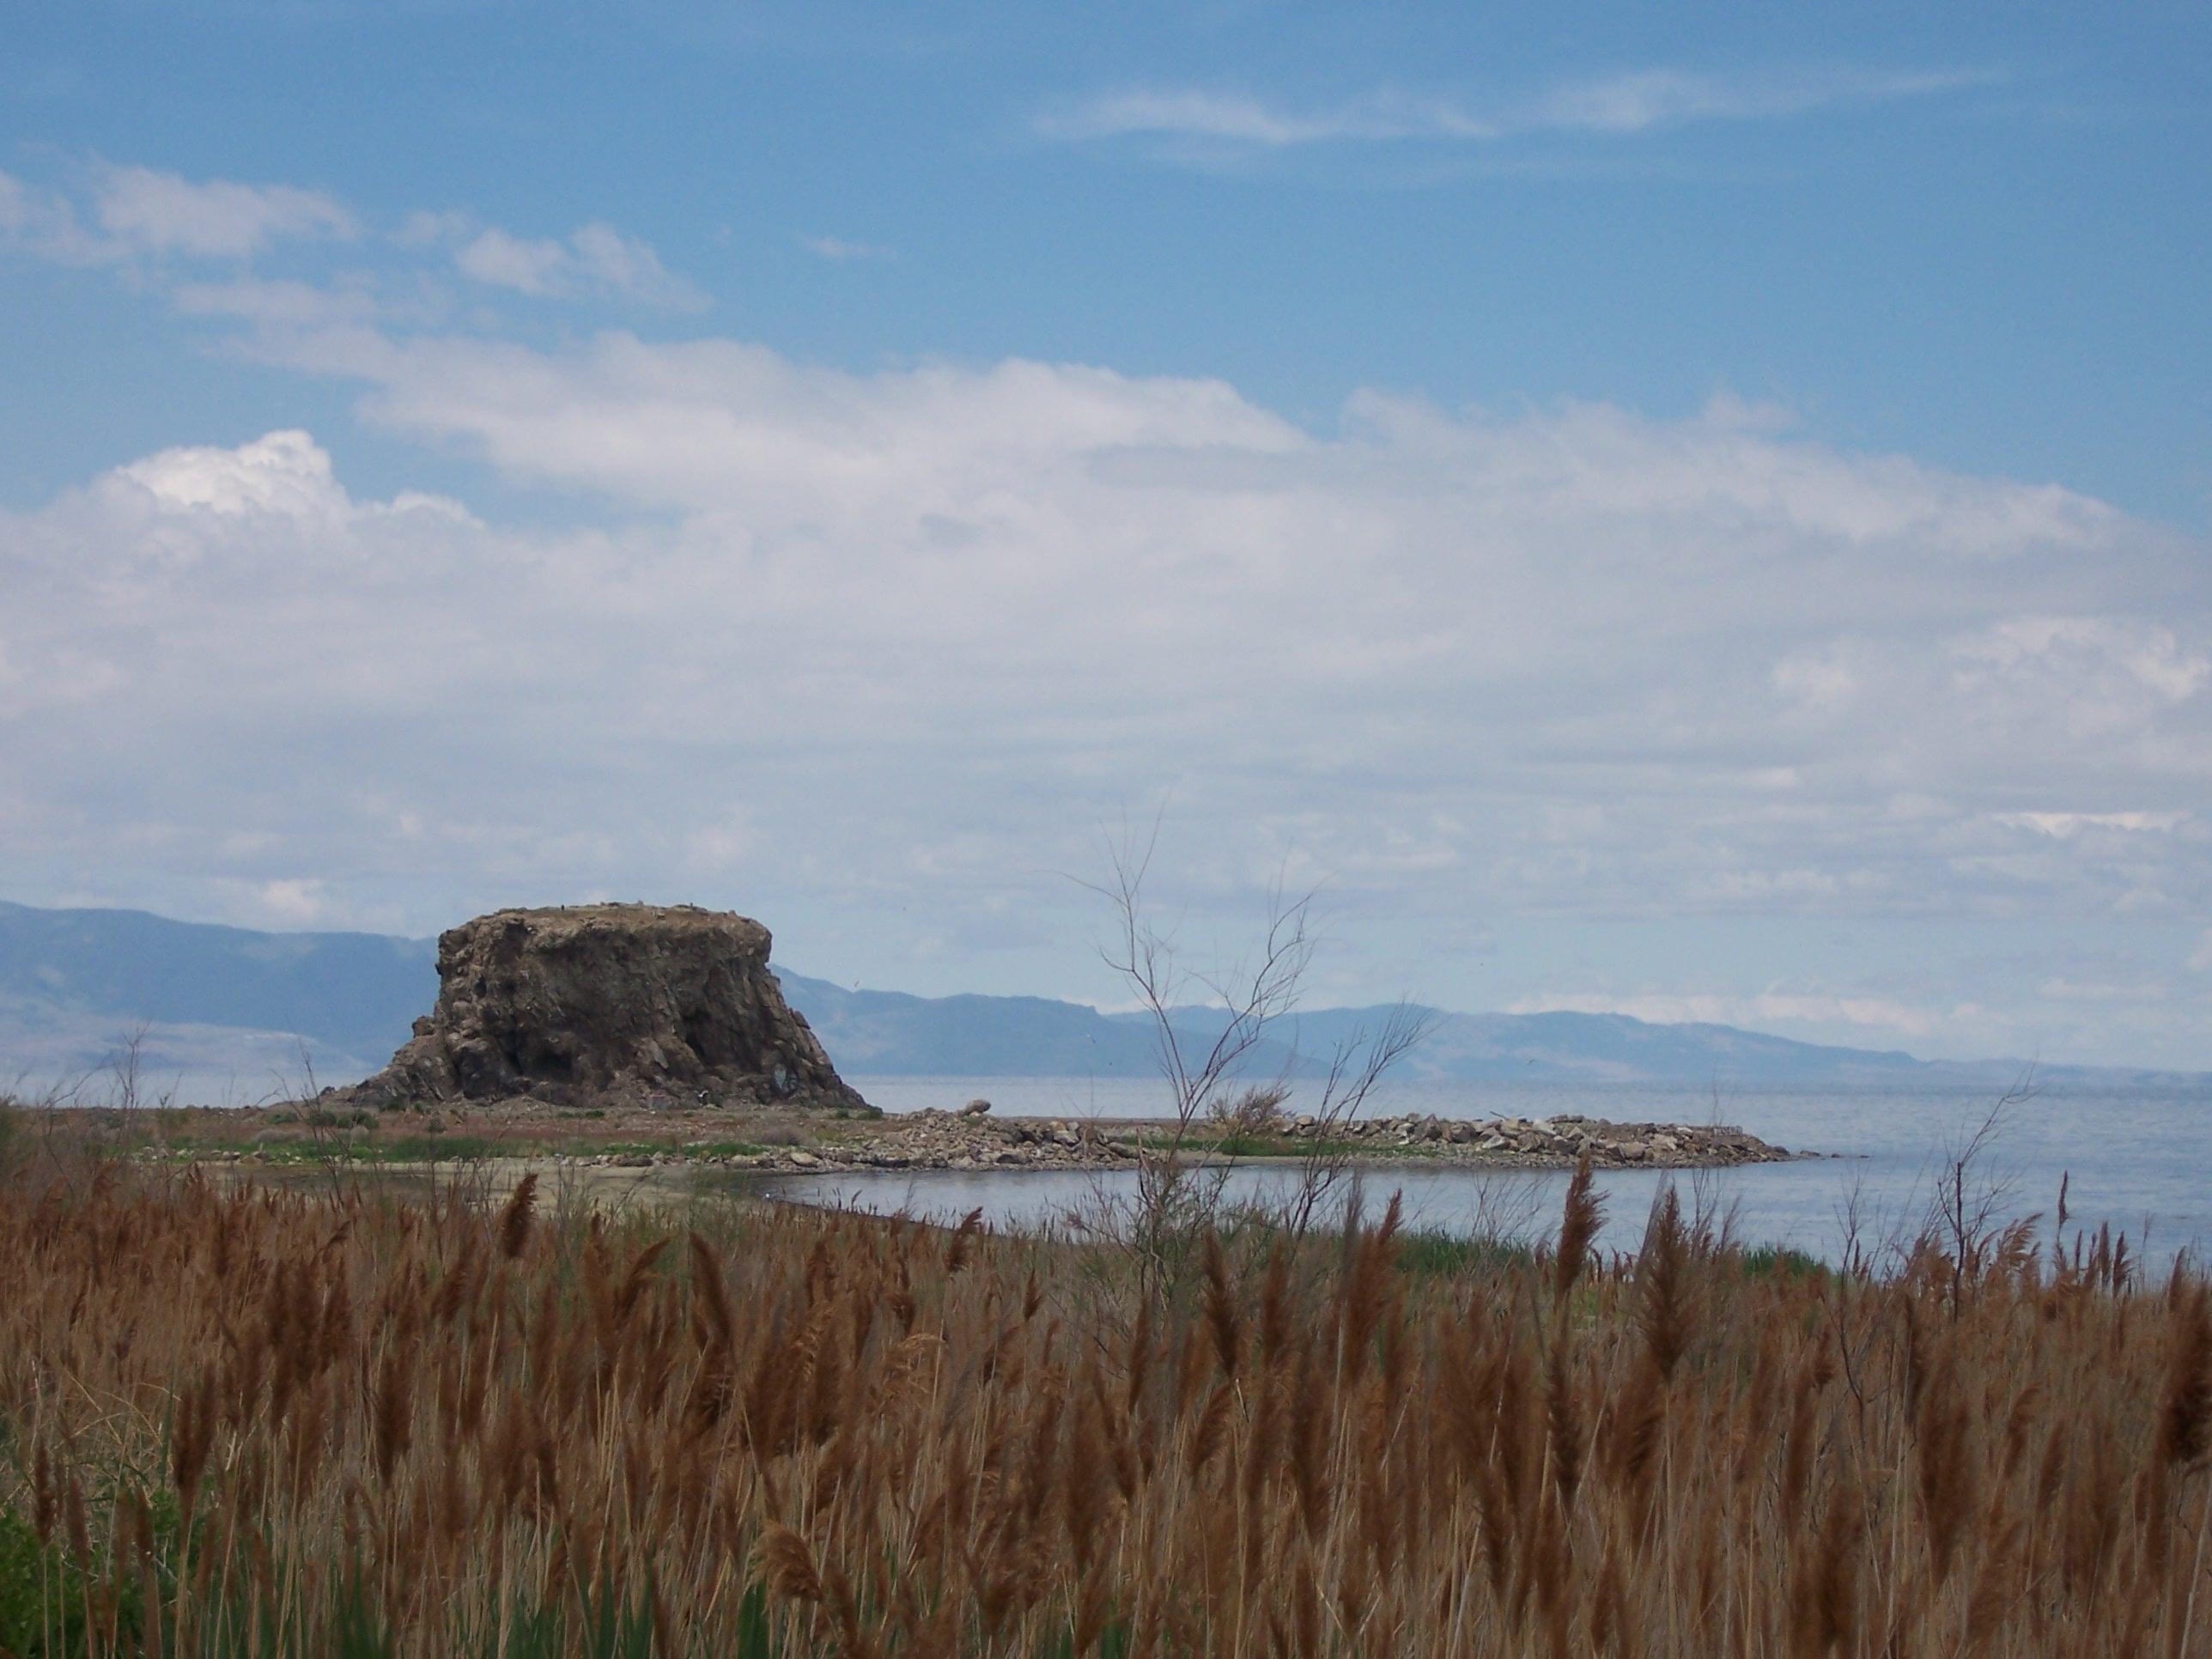 Ensign Peak, Black Rock, Salt Flats 059